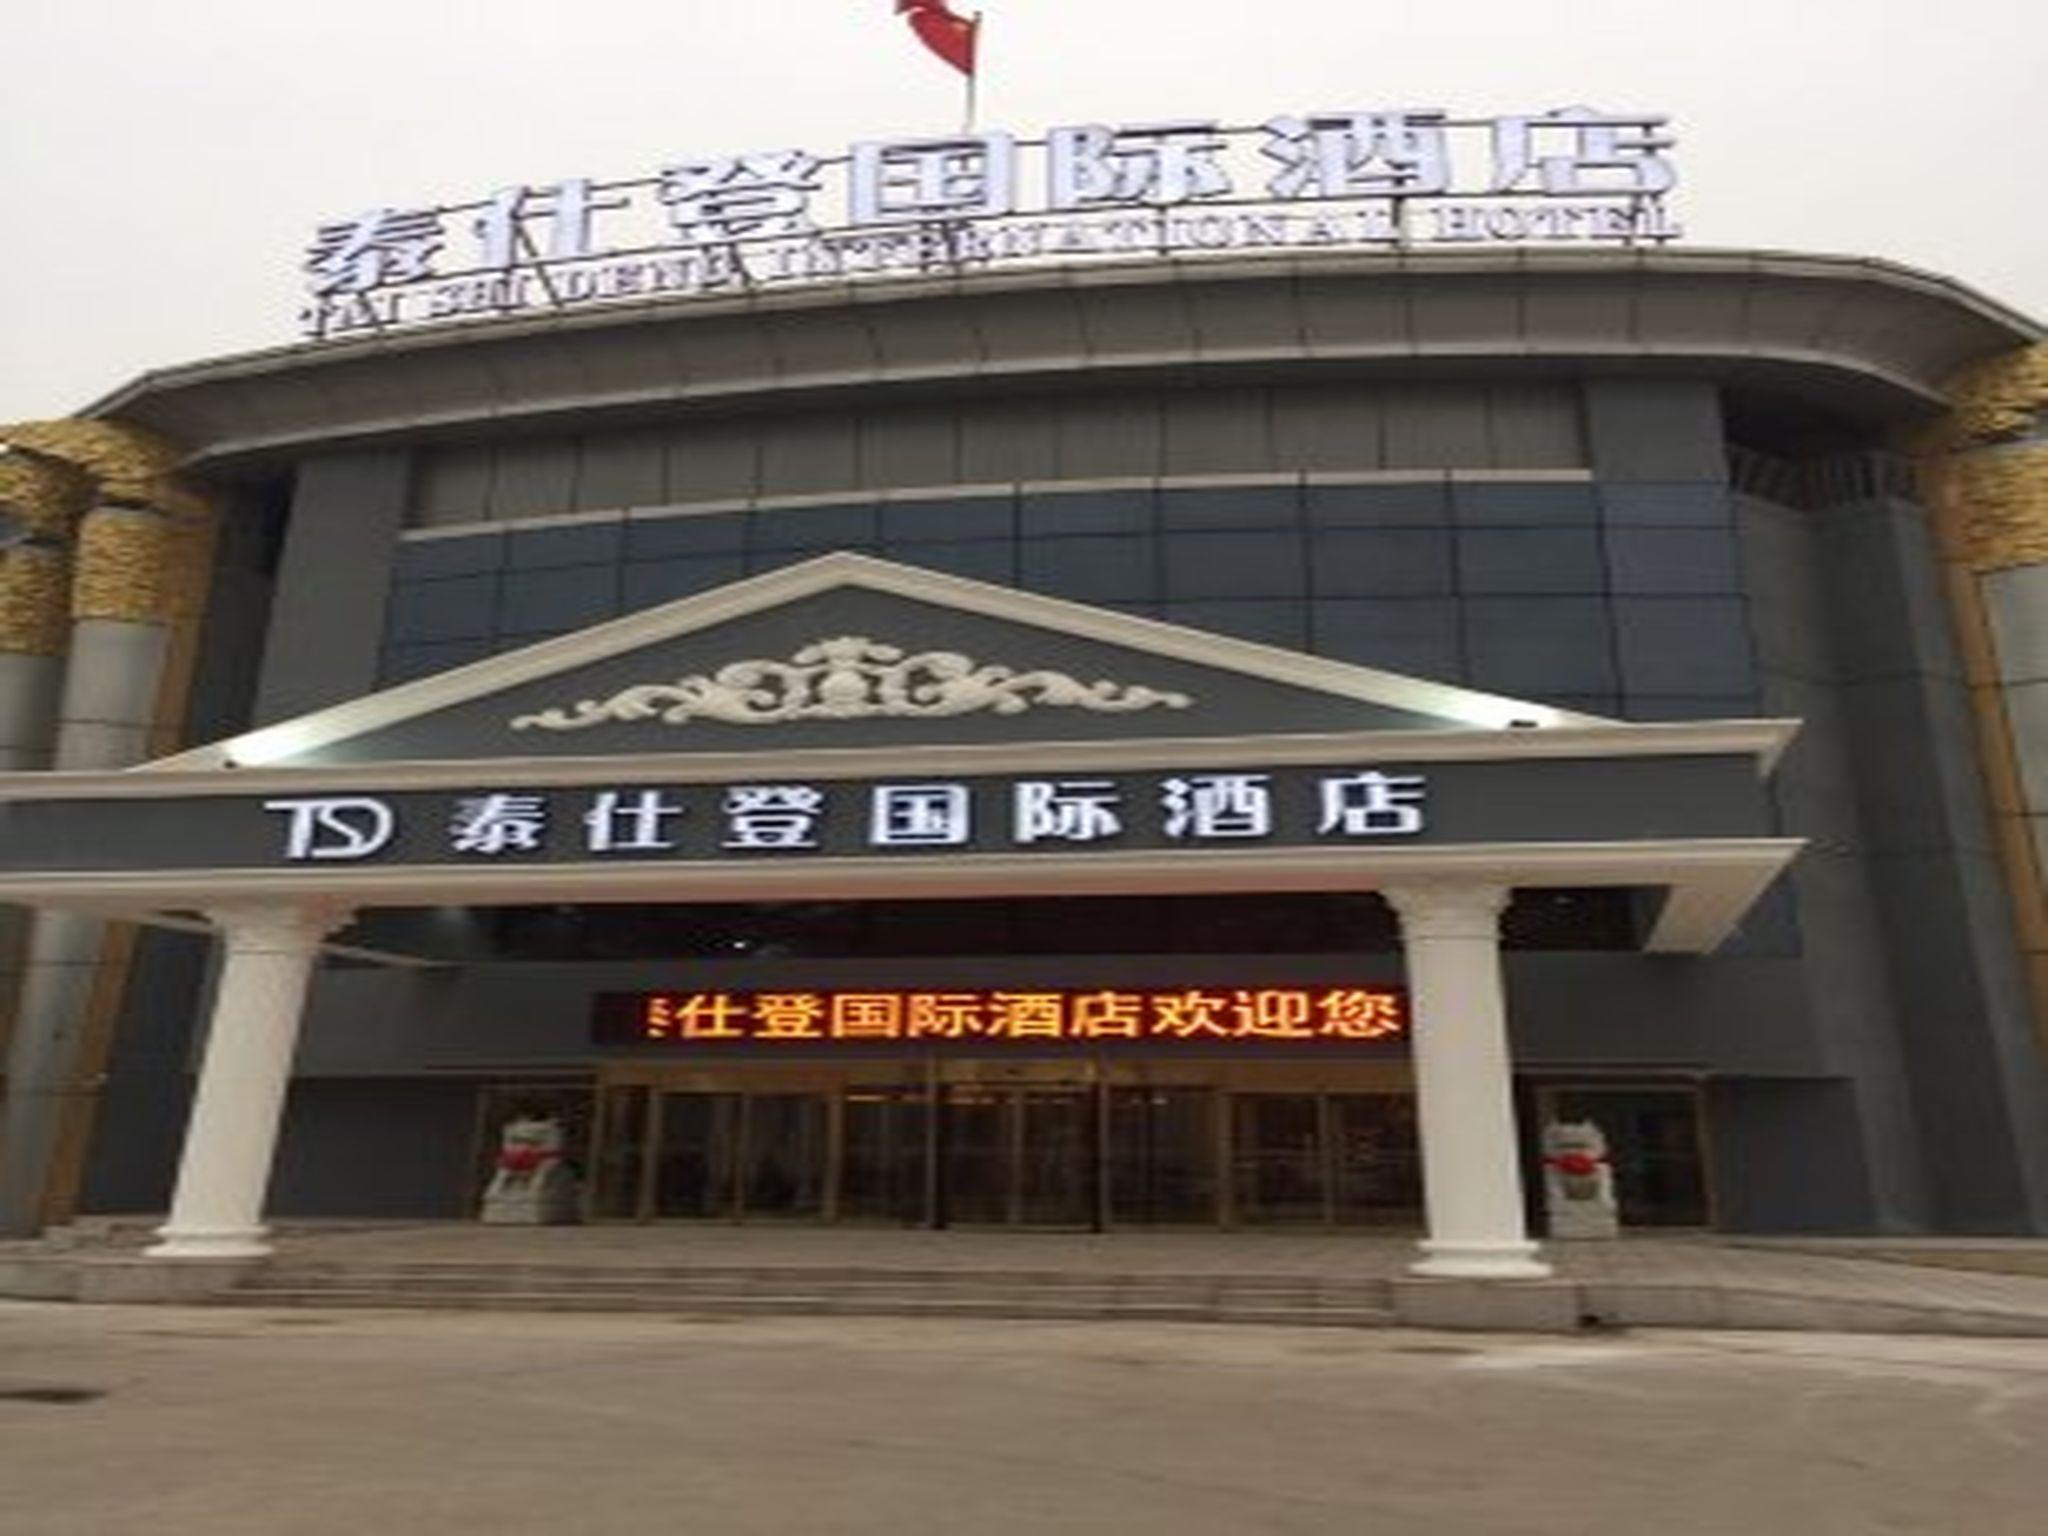 Tai Shi Deng International Hotel